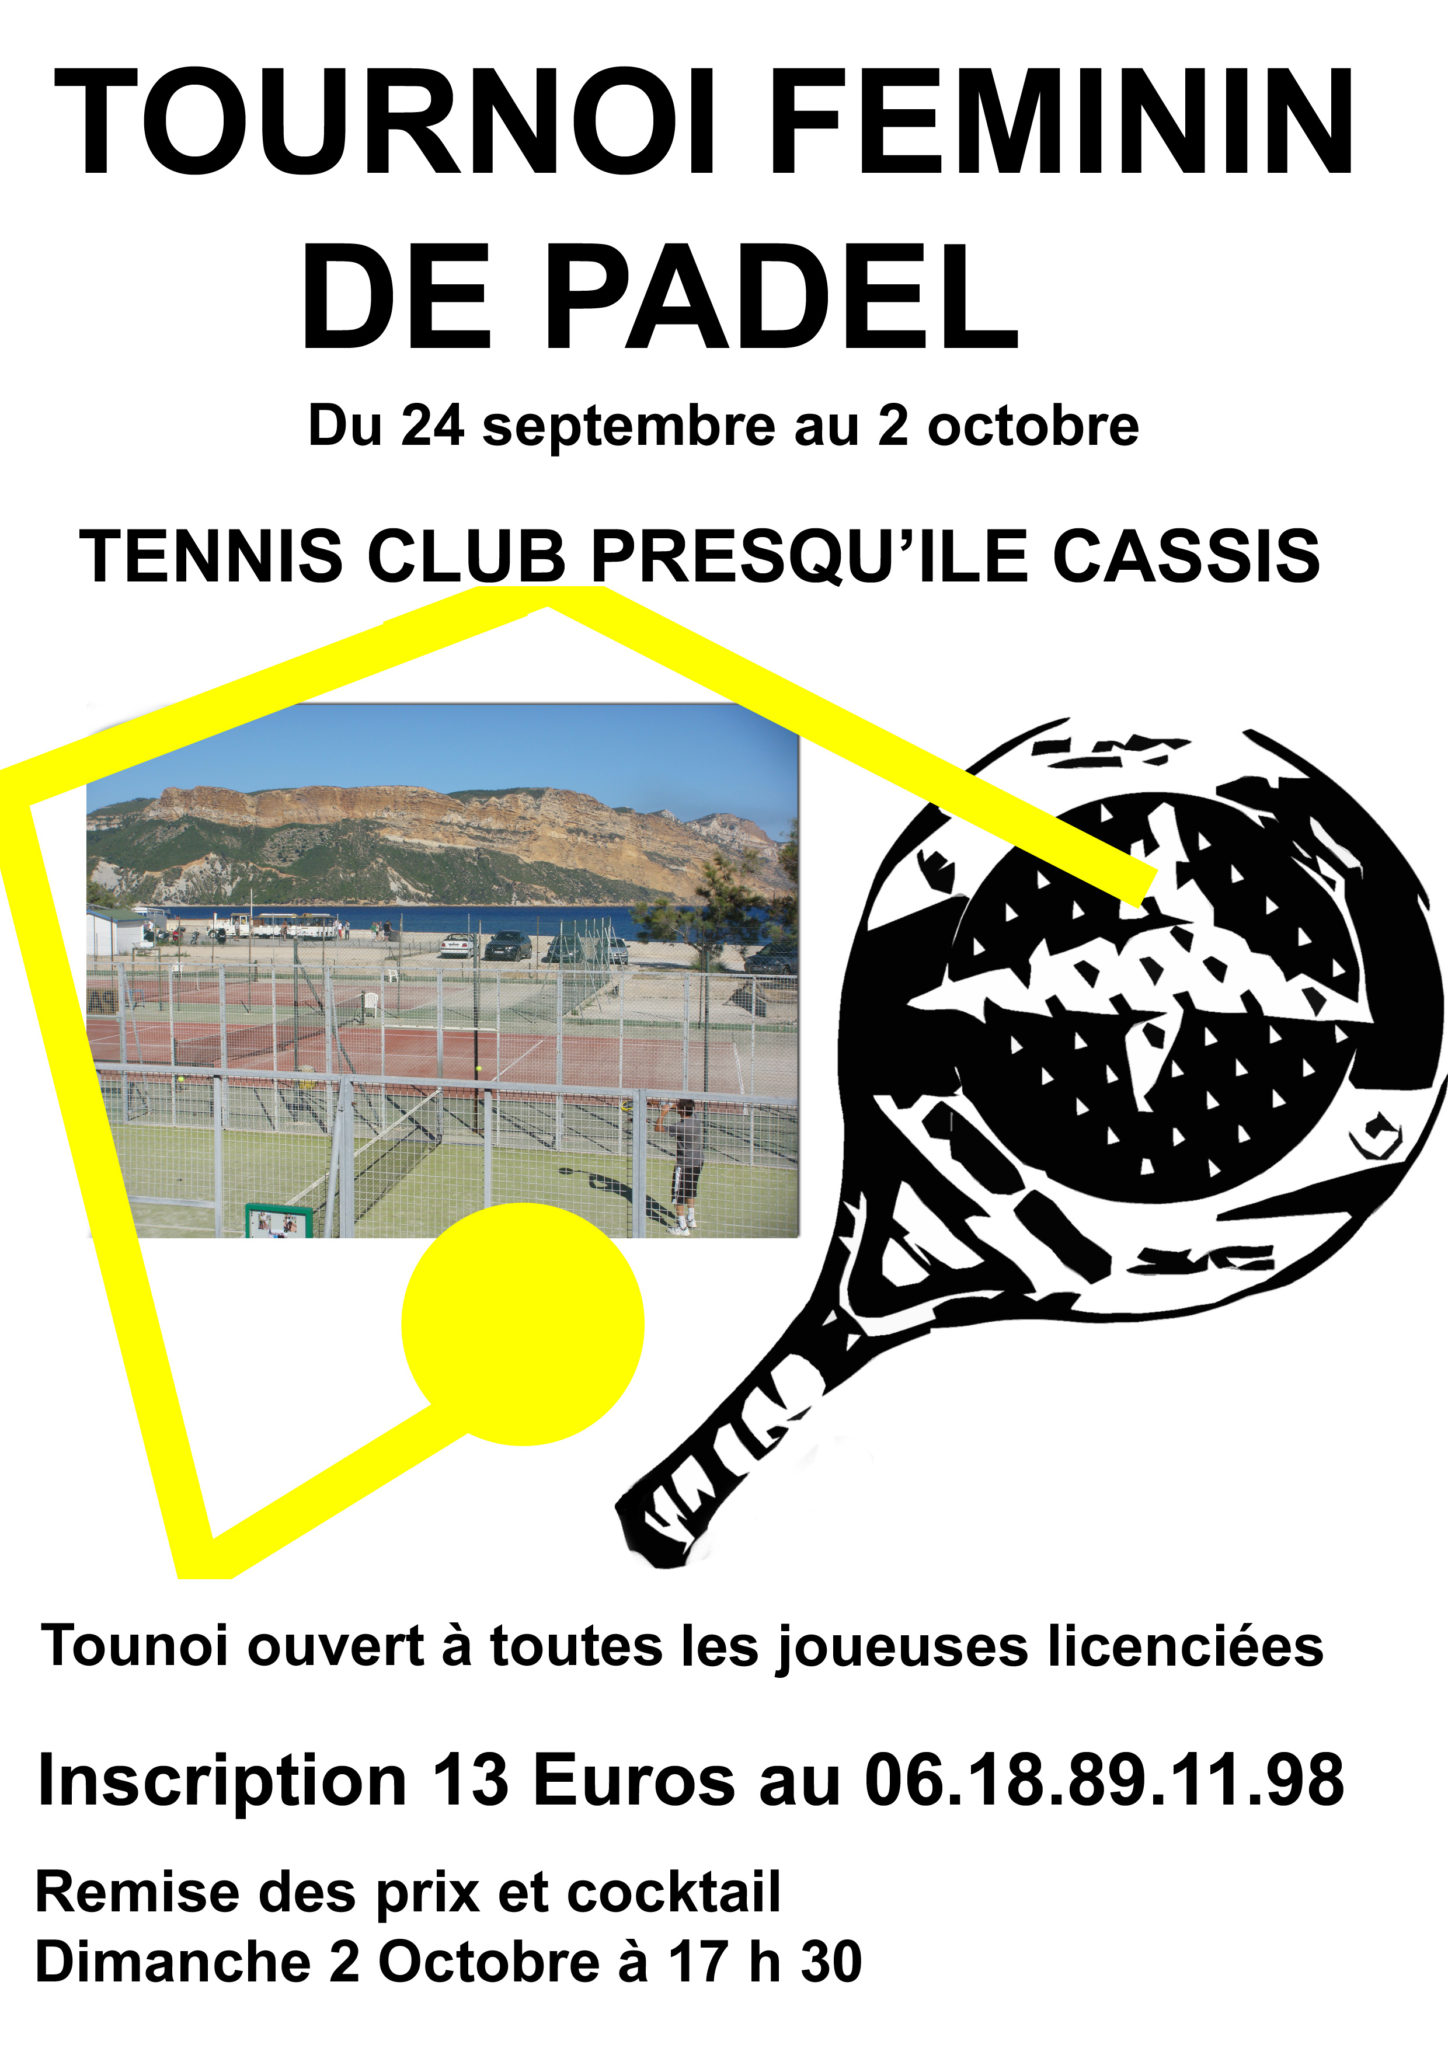 cartel del torneo